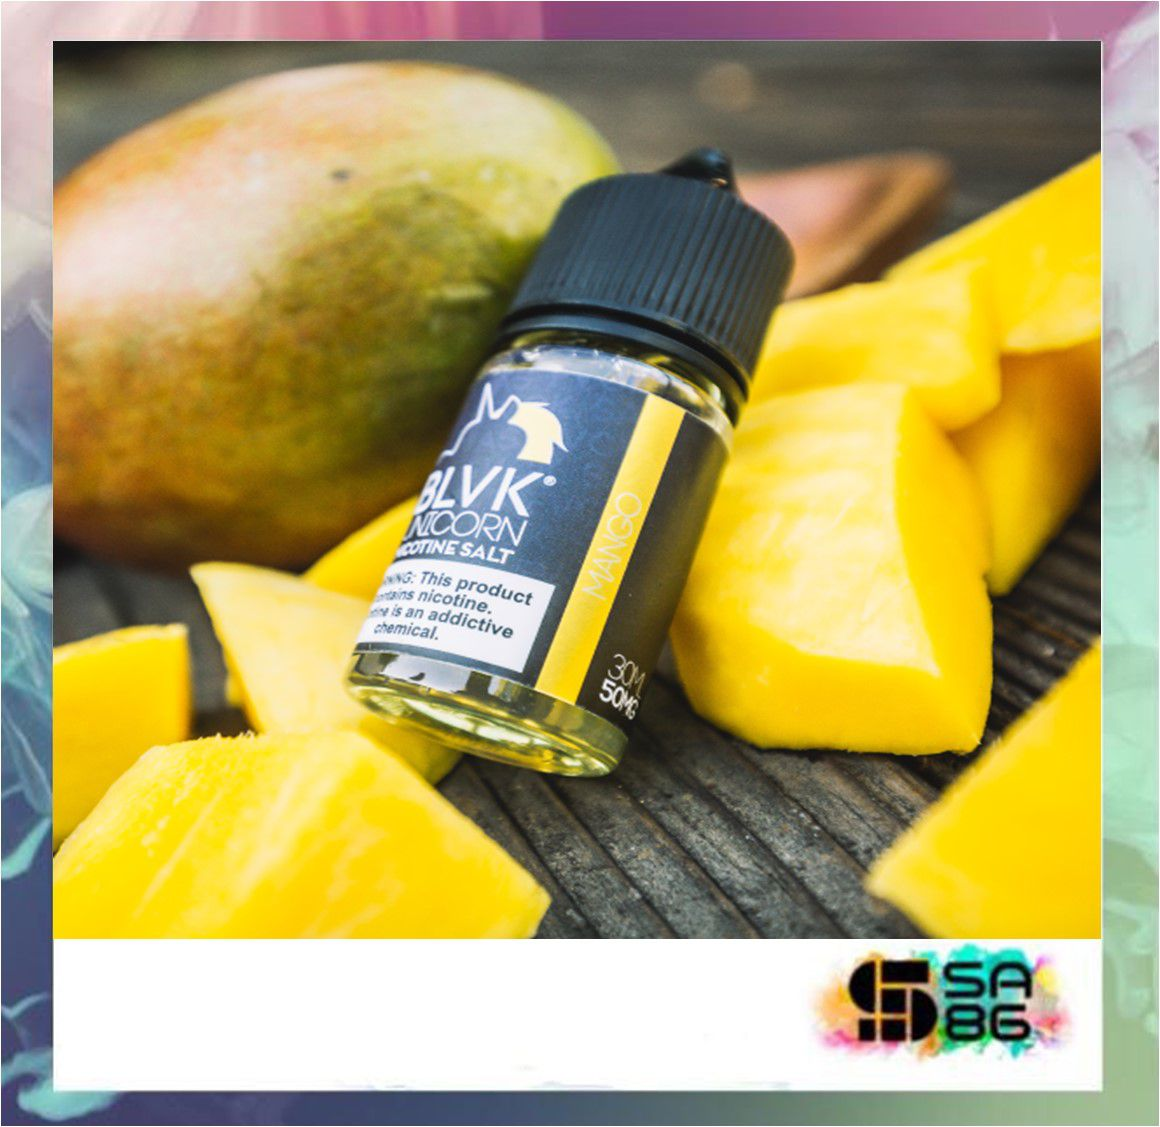 BLVK UNICORN NIC SALT 30 ML - Mango